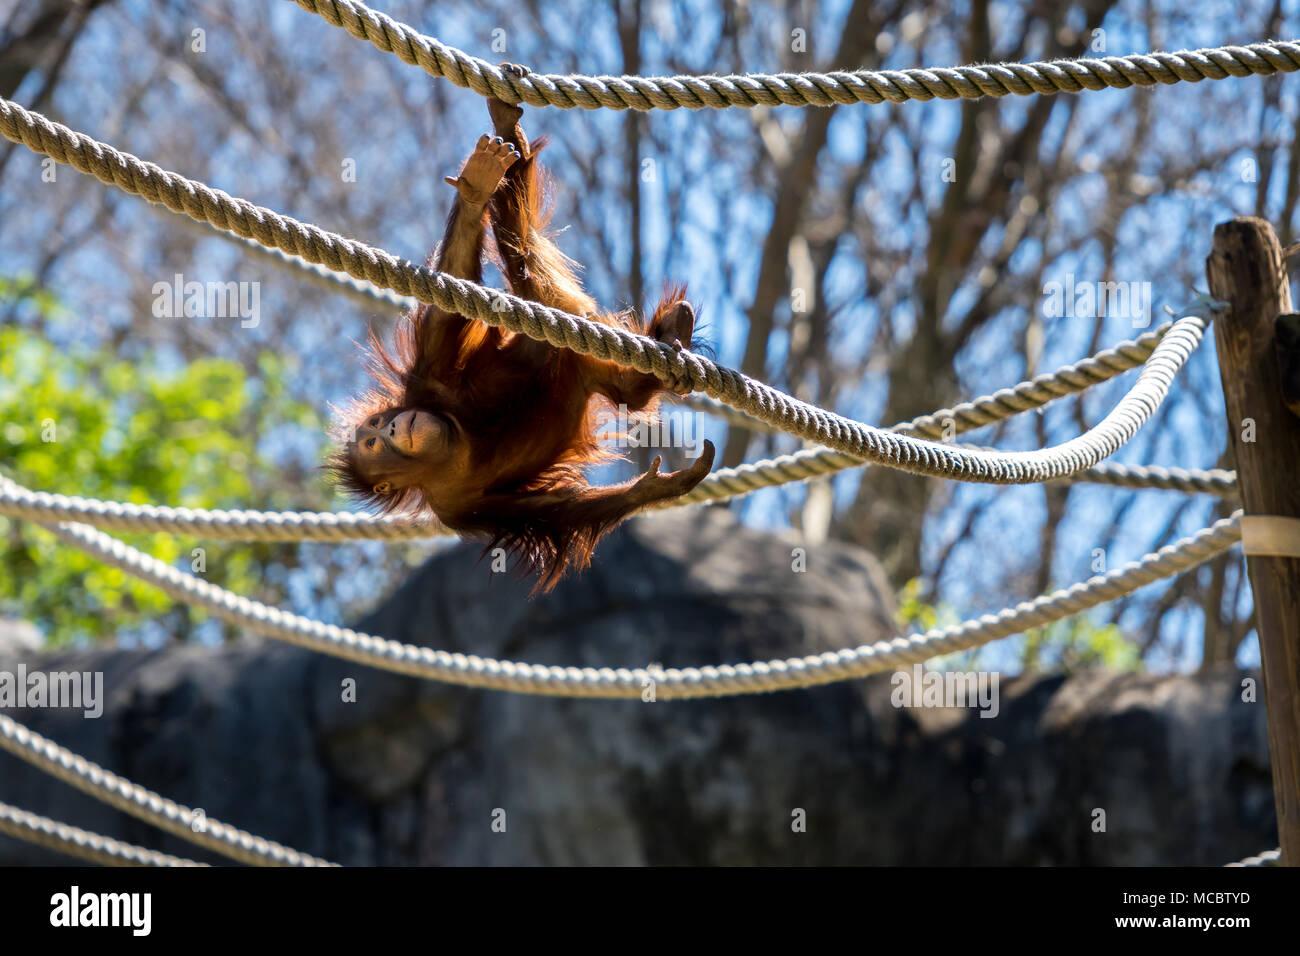 Young Orangutan Swings Upside Down - Stock Image